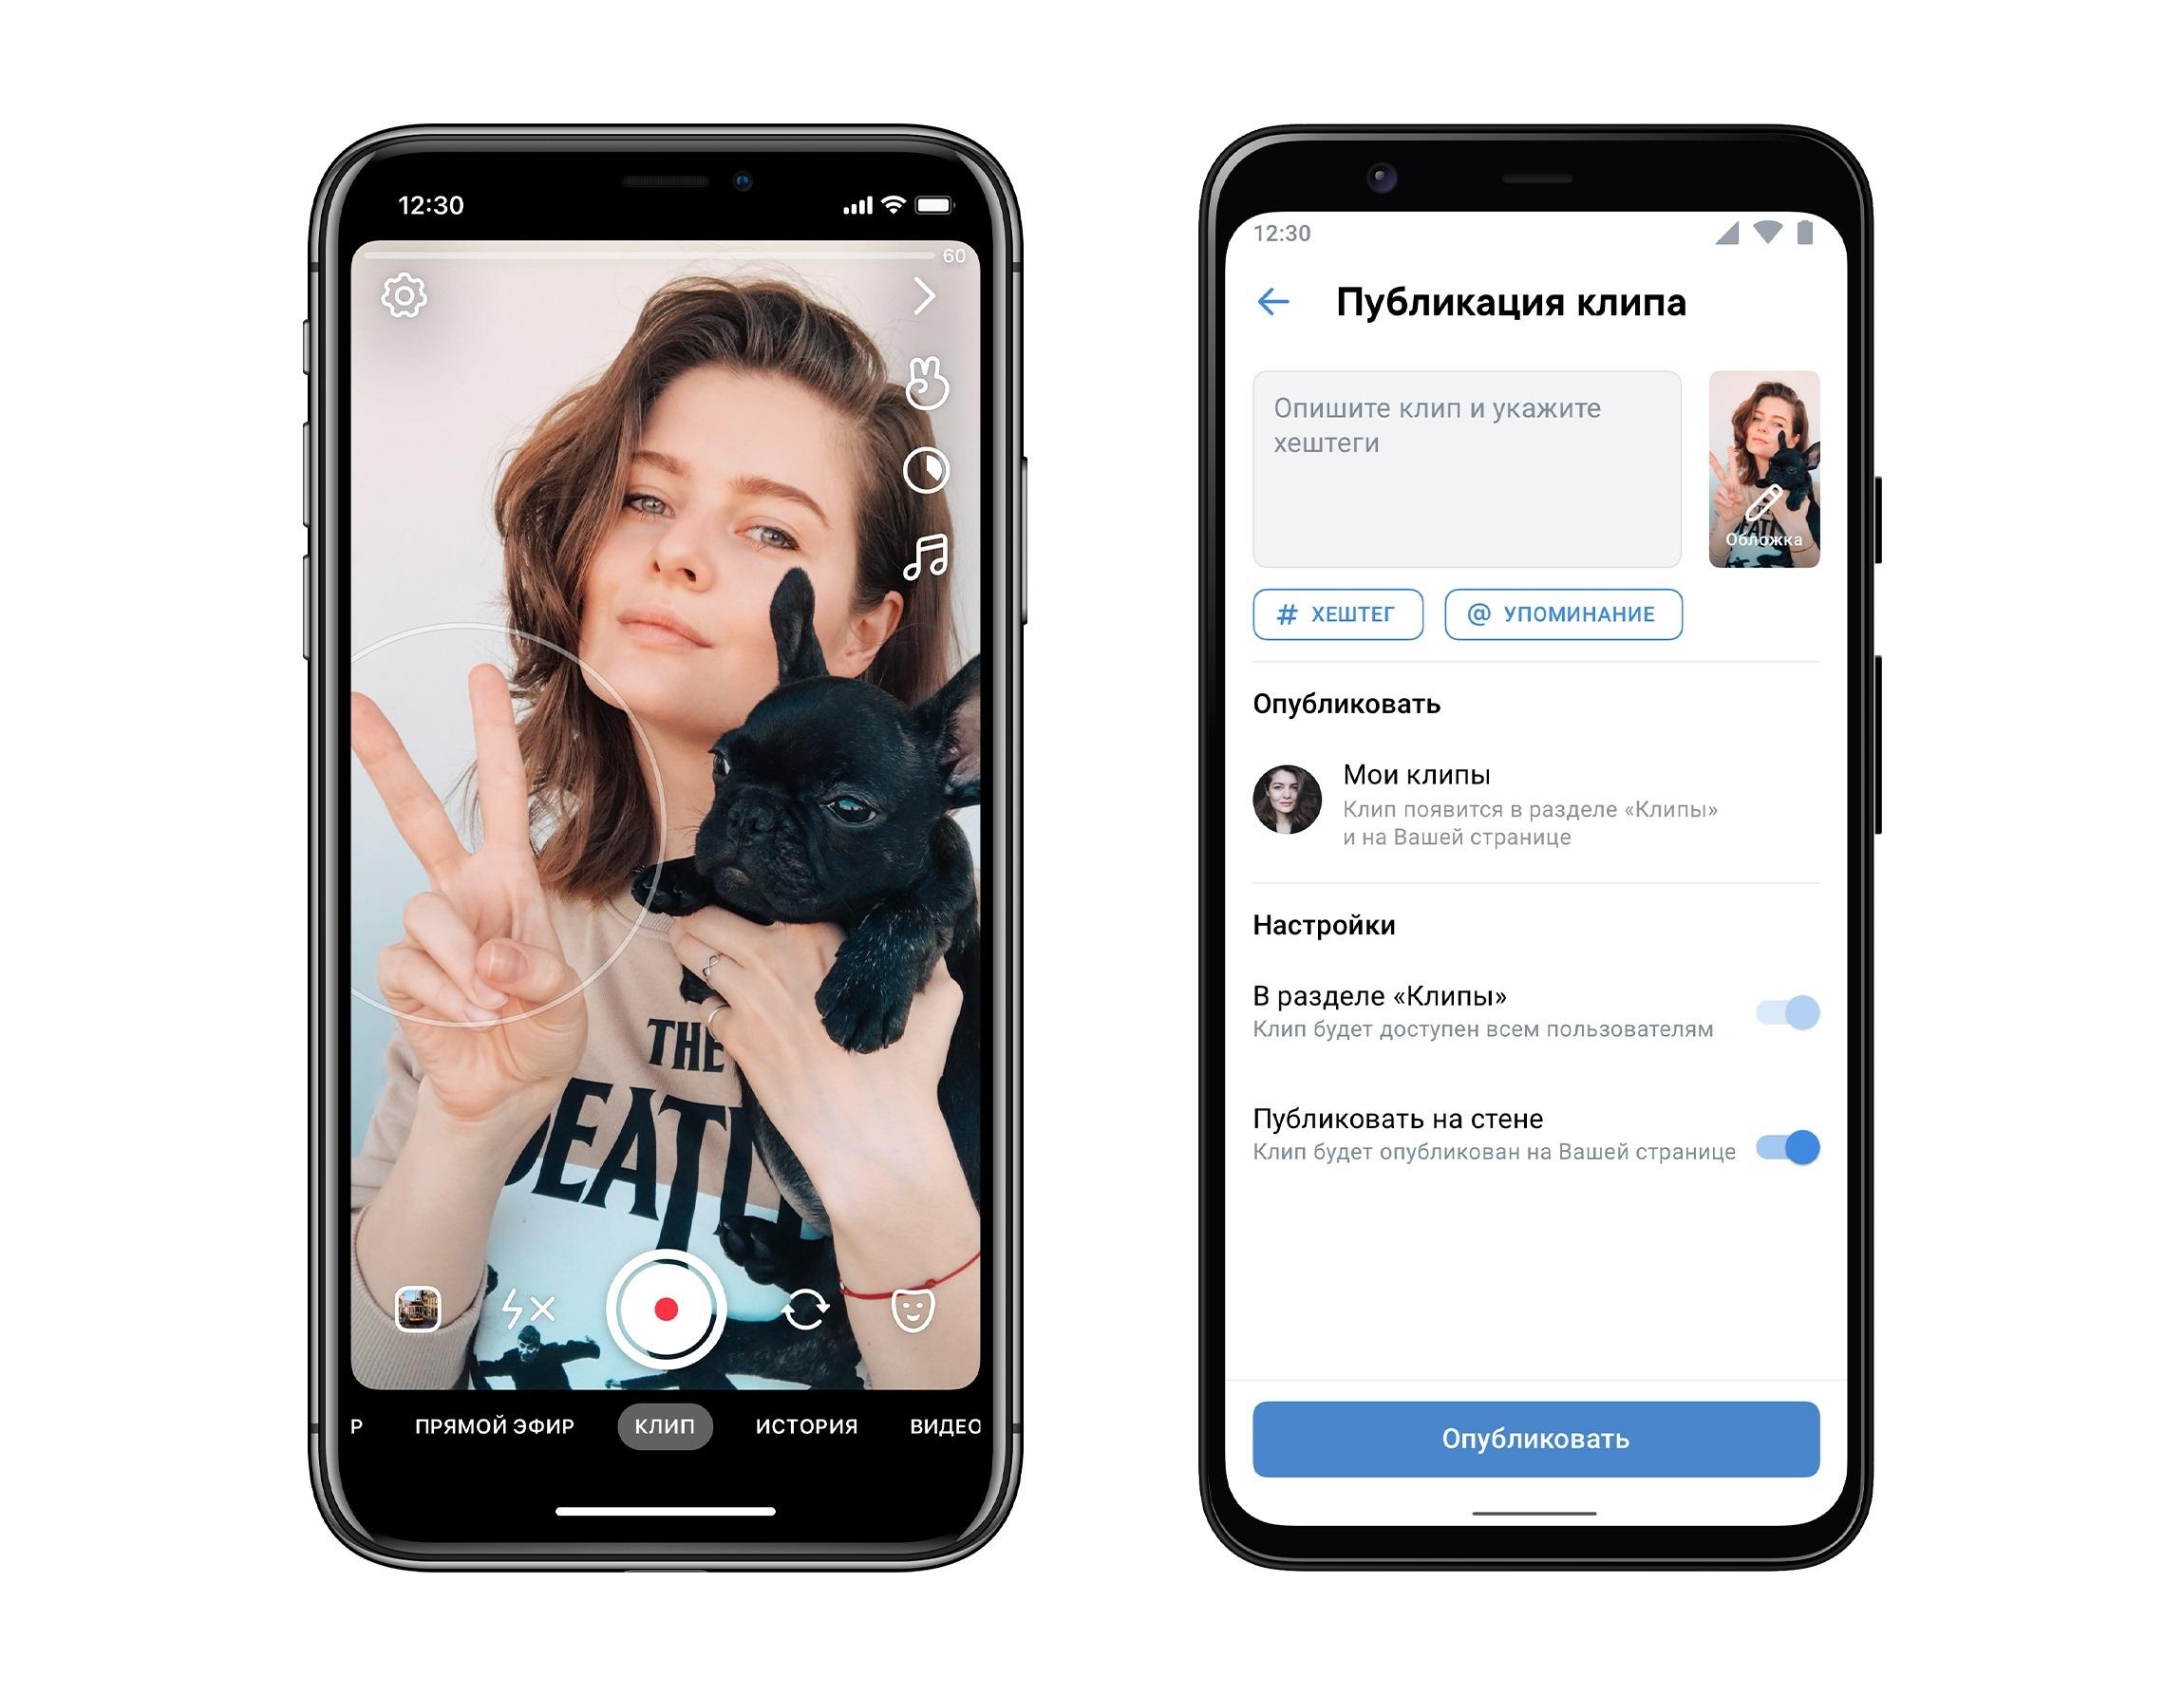 Публикация клипа ВКонтакте